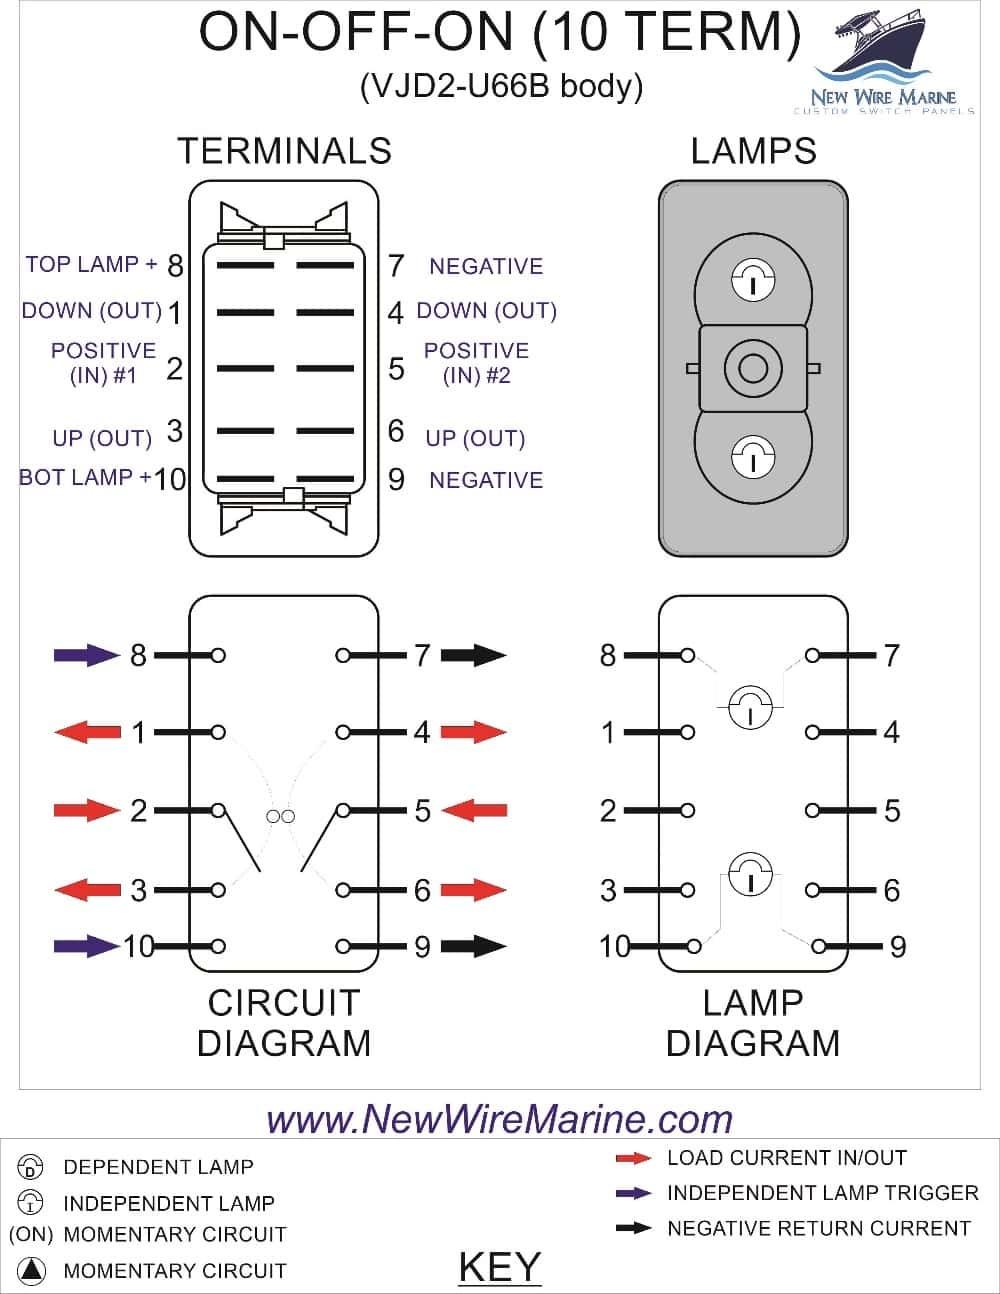 medium resolution of carling toggle switch wiring diagram carling toggle switch wiring diagram collection on off backlit rocker